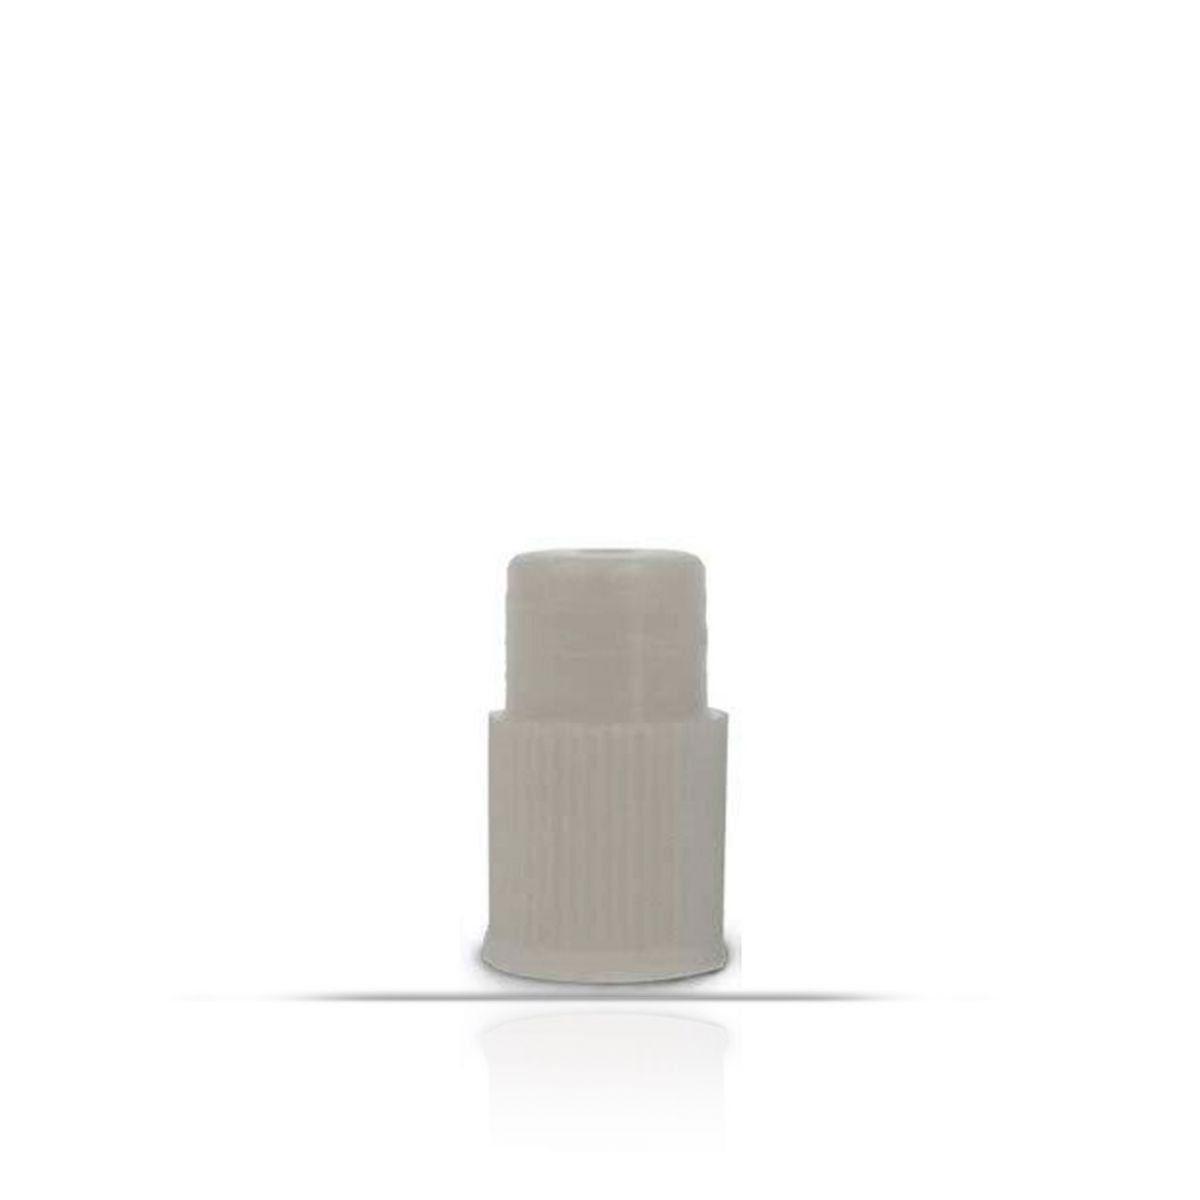 Tampa Reta Para Tubos de Ensaio, 13mm. 1000 un/pct. Olen